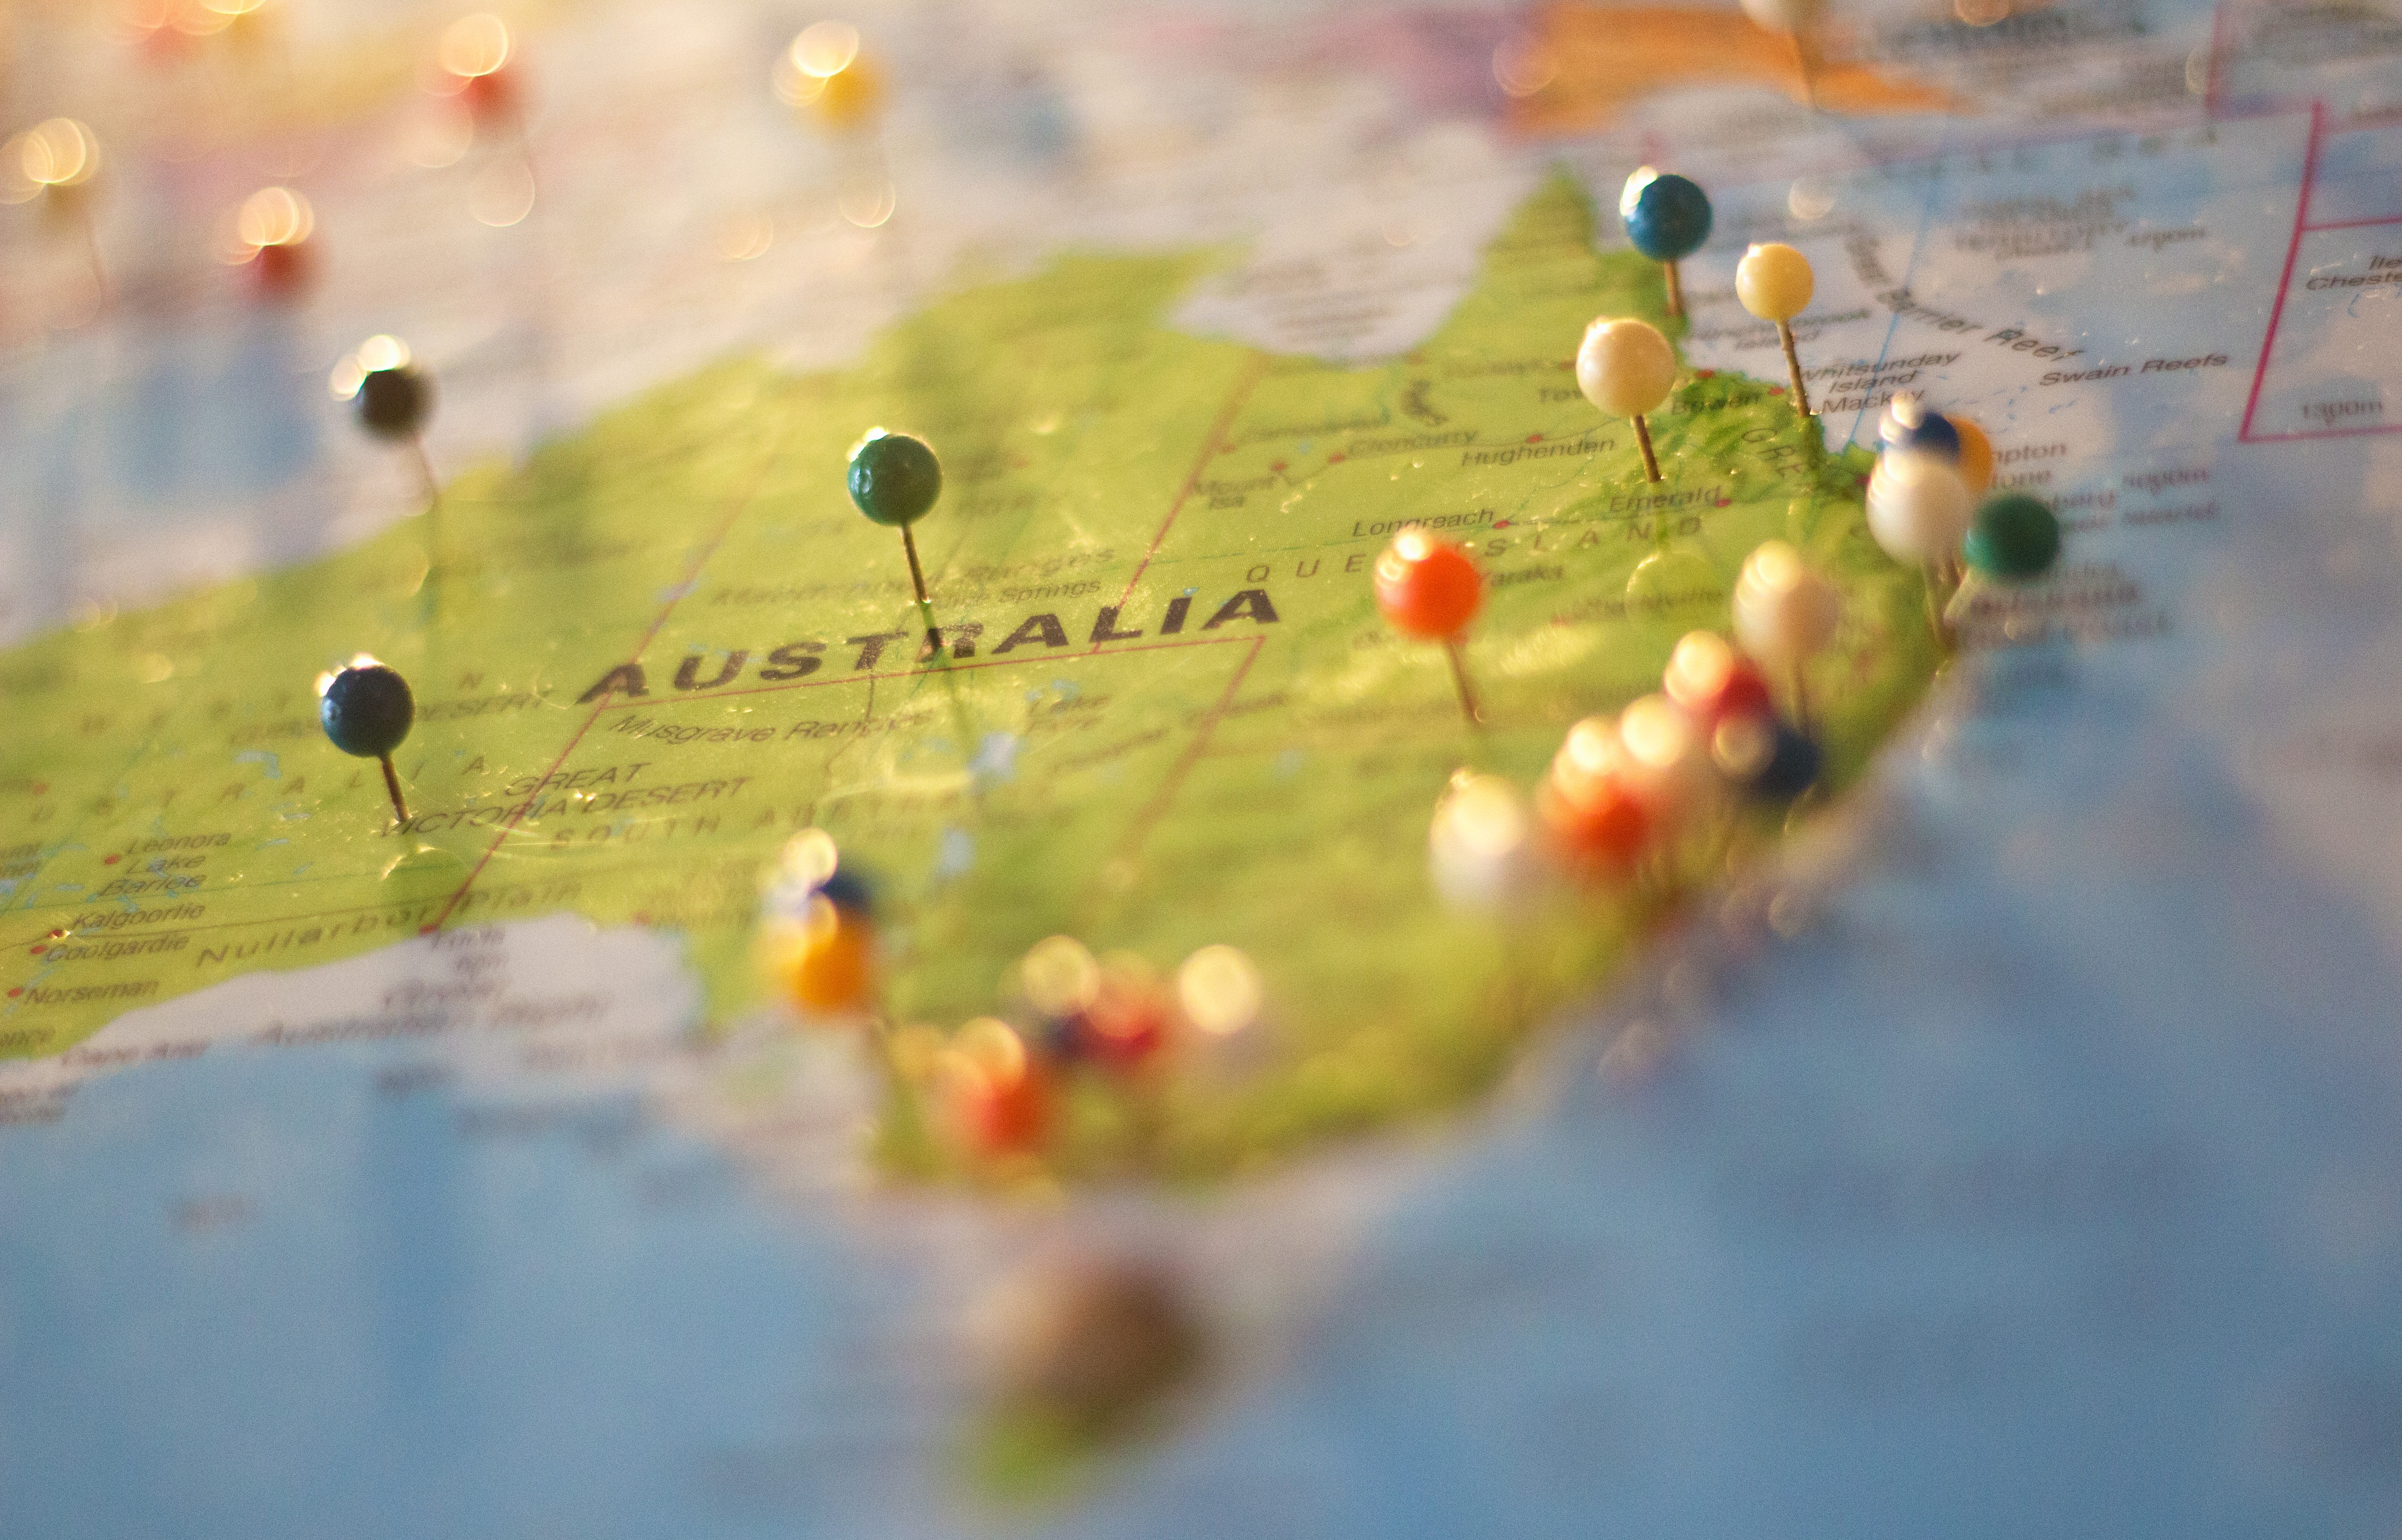 Australia Map, Australia, Destination, Geography, Locations, HQ Photo